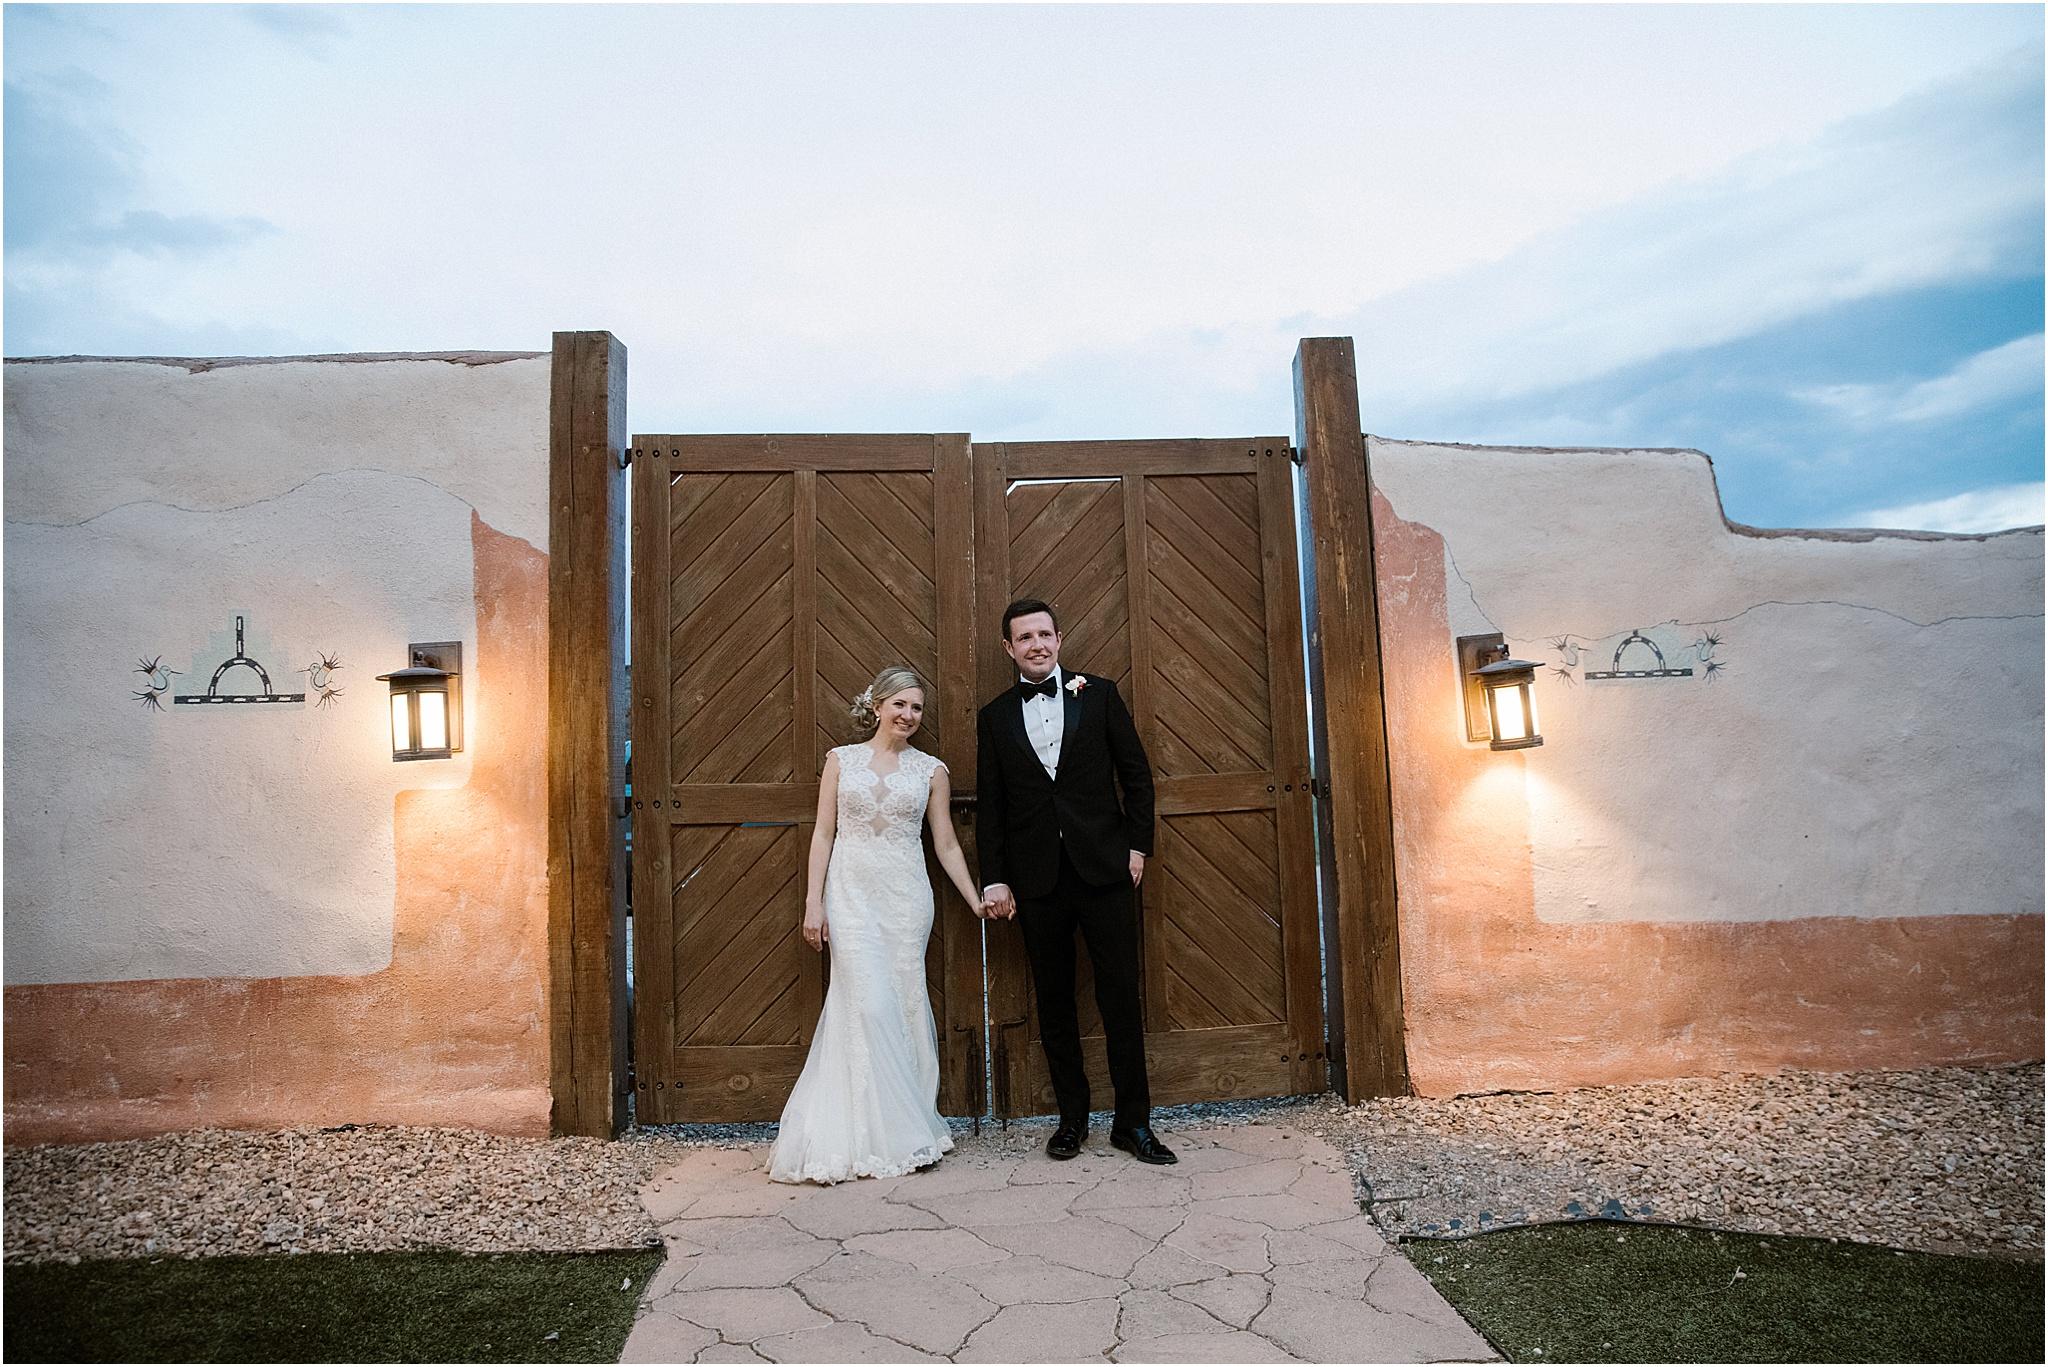 JENNA_JEROME_BLUE ROSE PHOTOGRAPHY_ABQ WEDDING_56